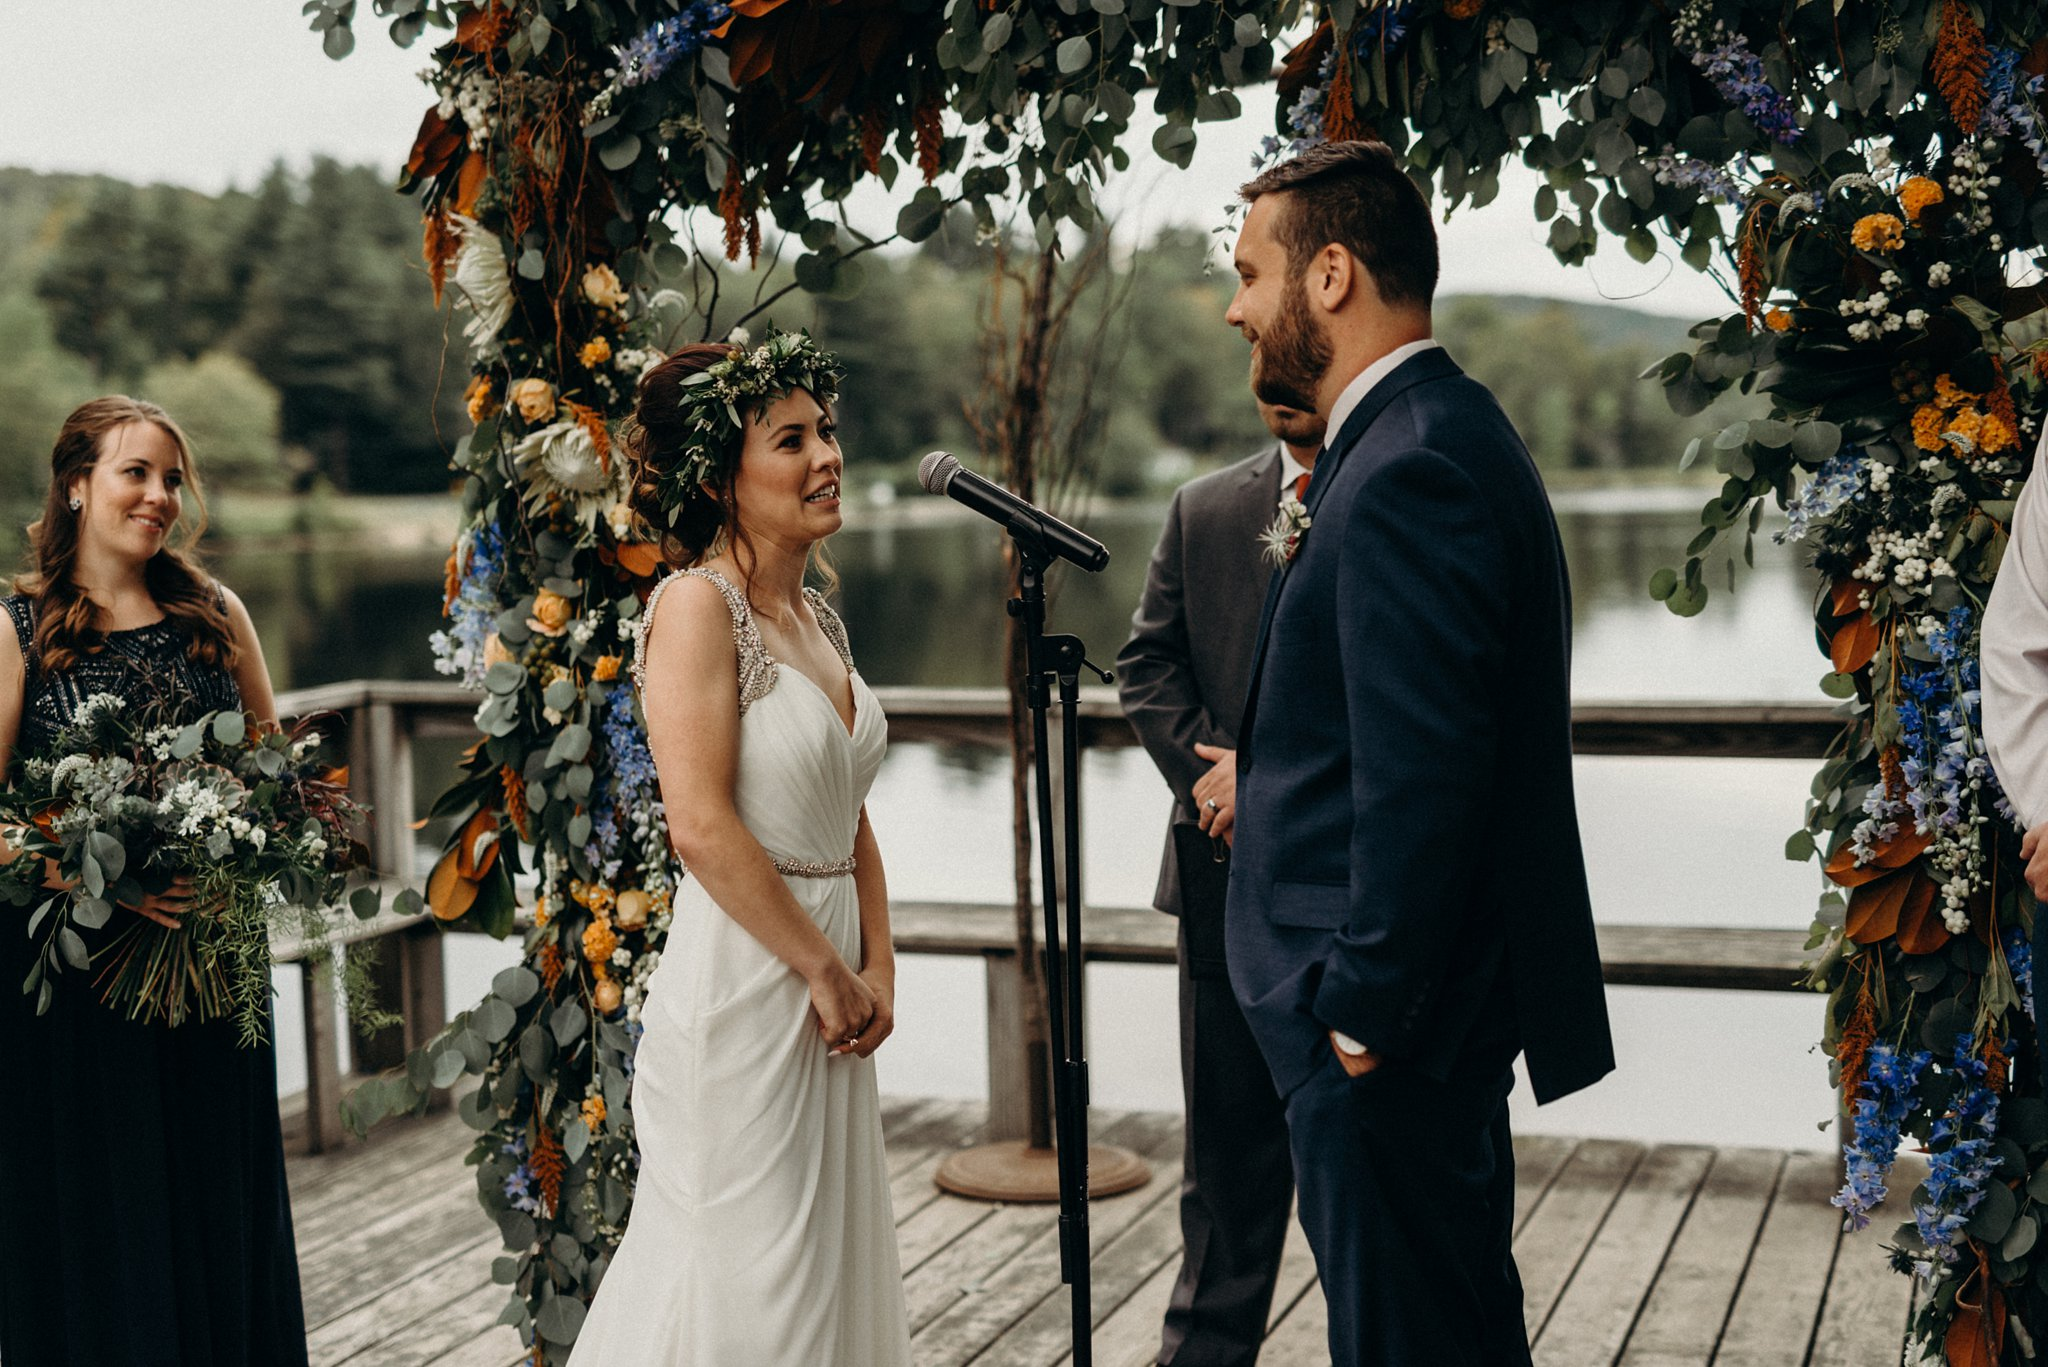 kaihla_tonai_intimate_wedding_elopement_photographer_6635.jpg